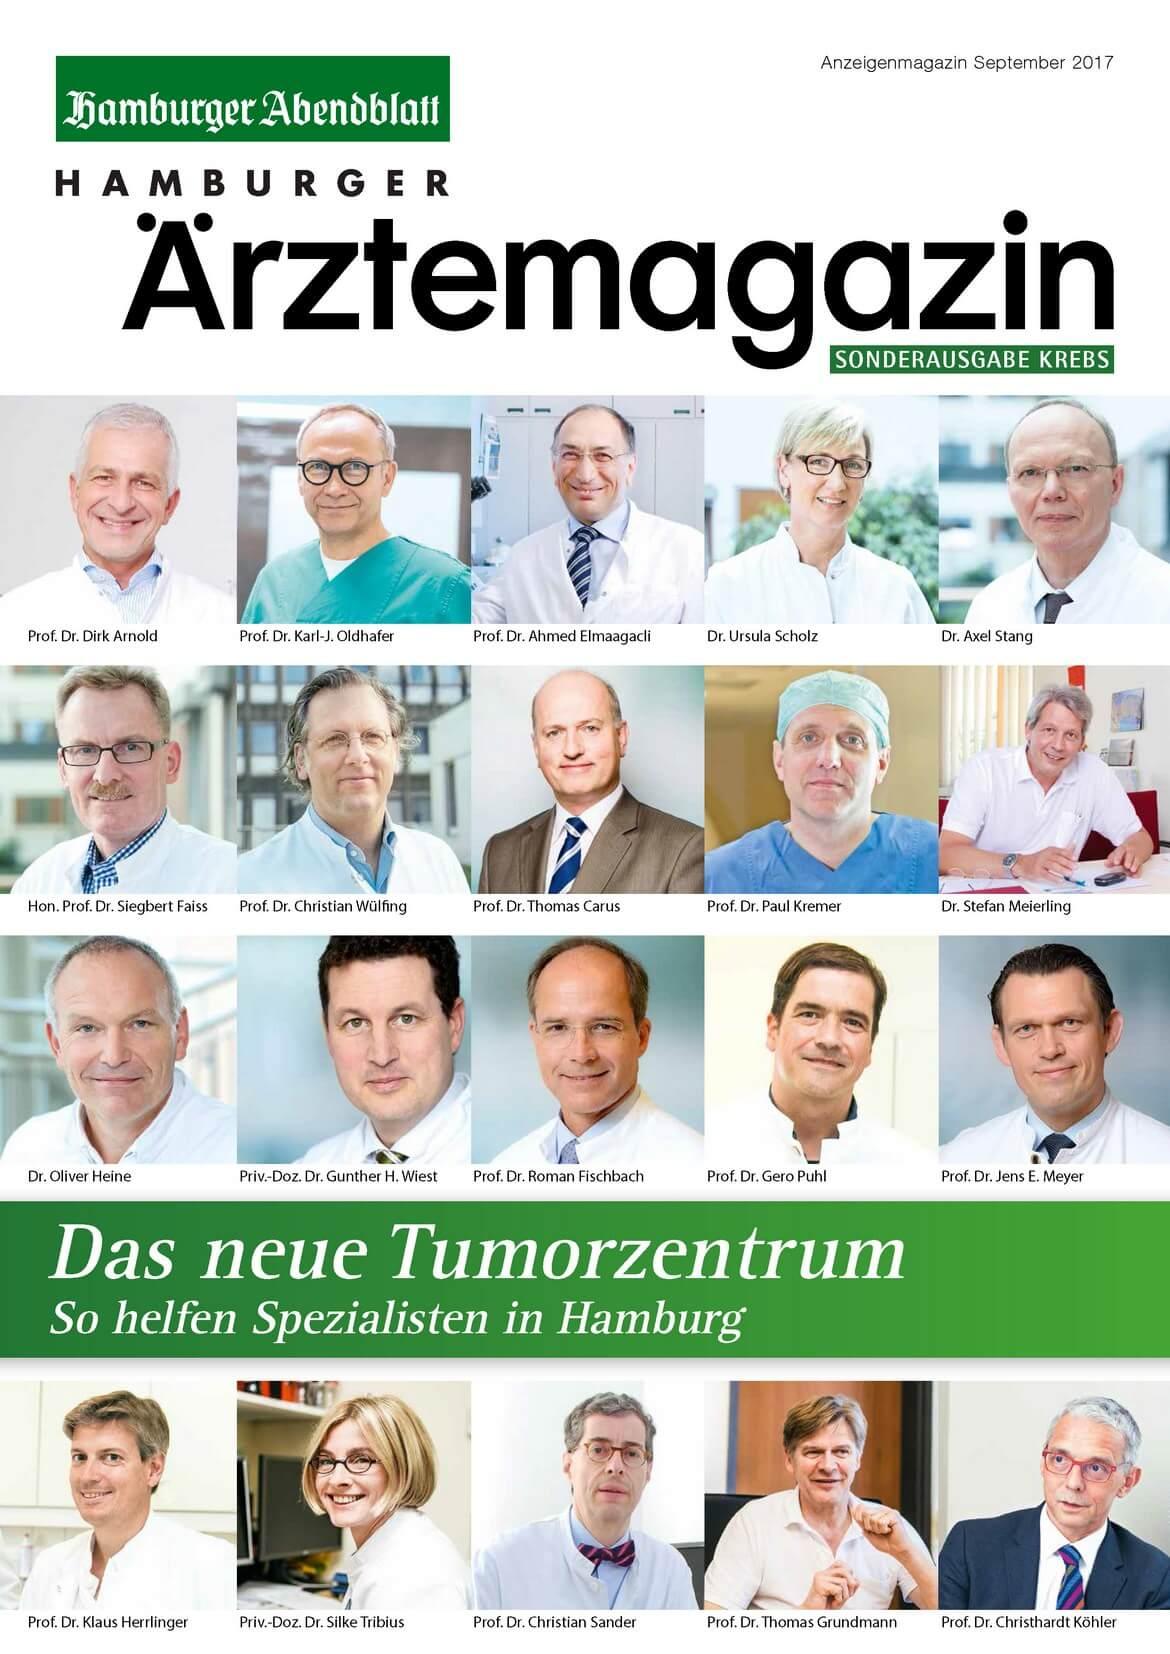 Hamburger Ärztemagazin Sonderausgabe Krebs erschienen